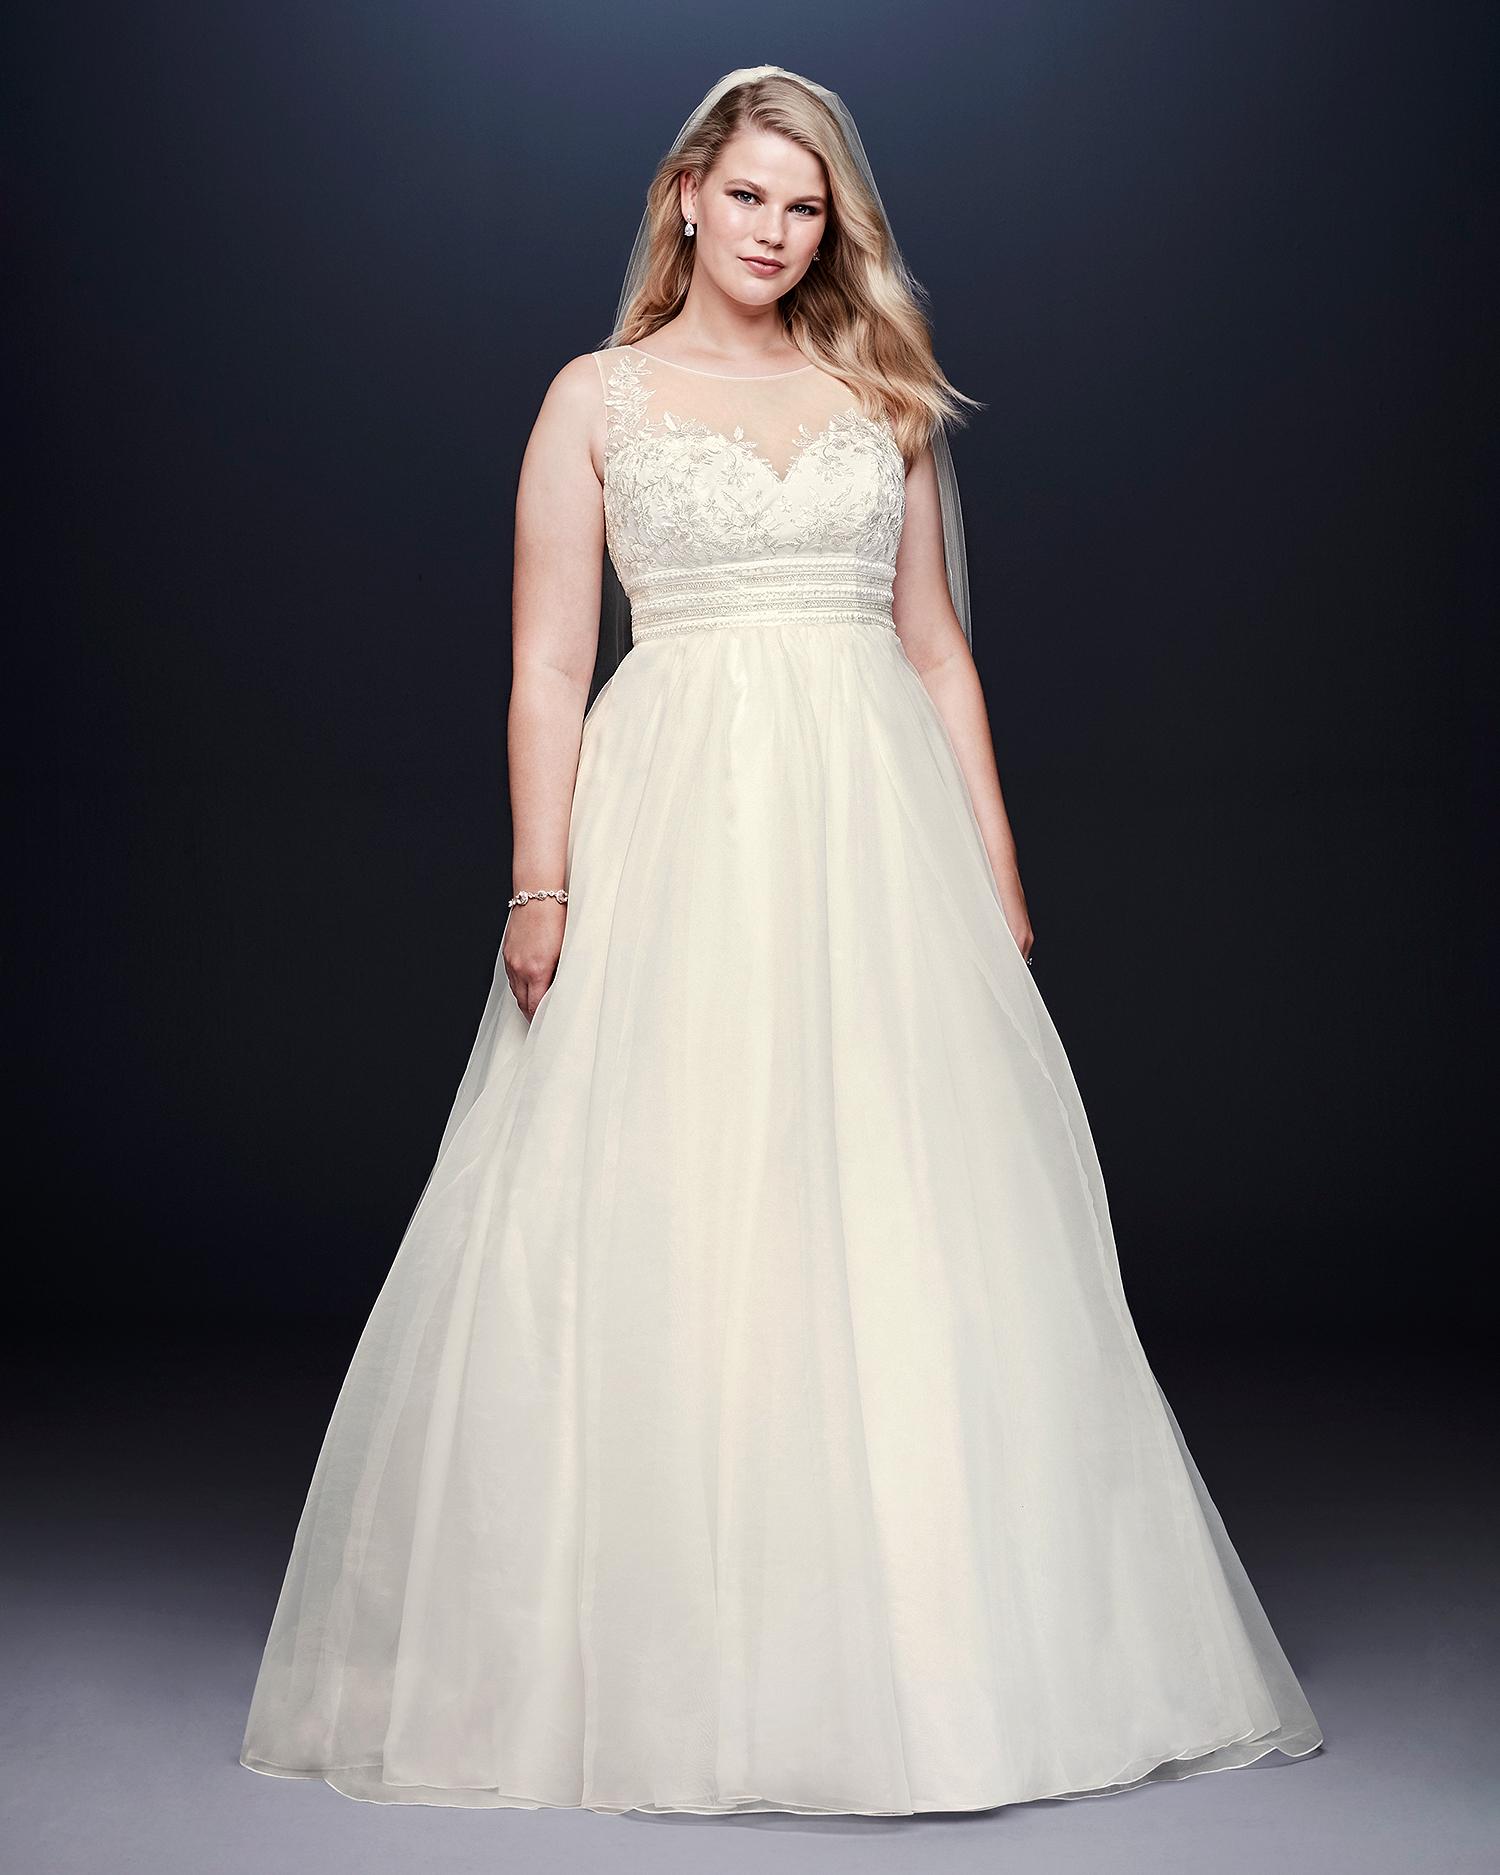 davids bridal wedding dress fall 2019 high illusion neck a-line